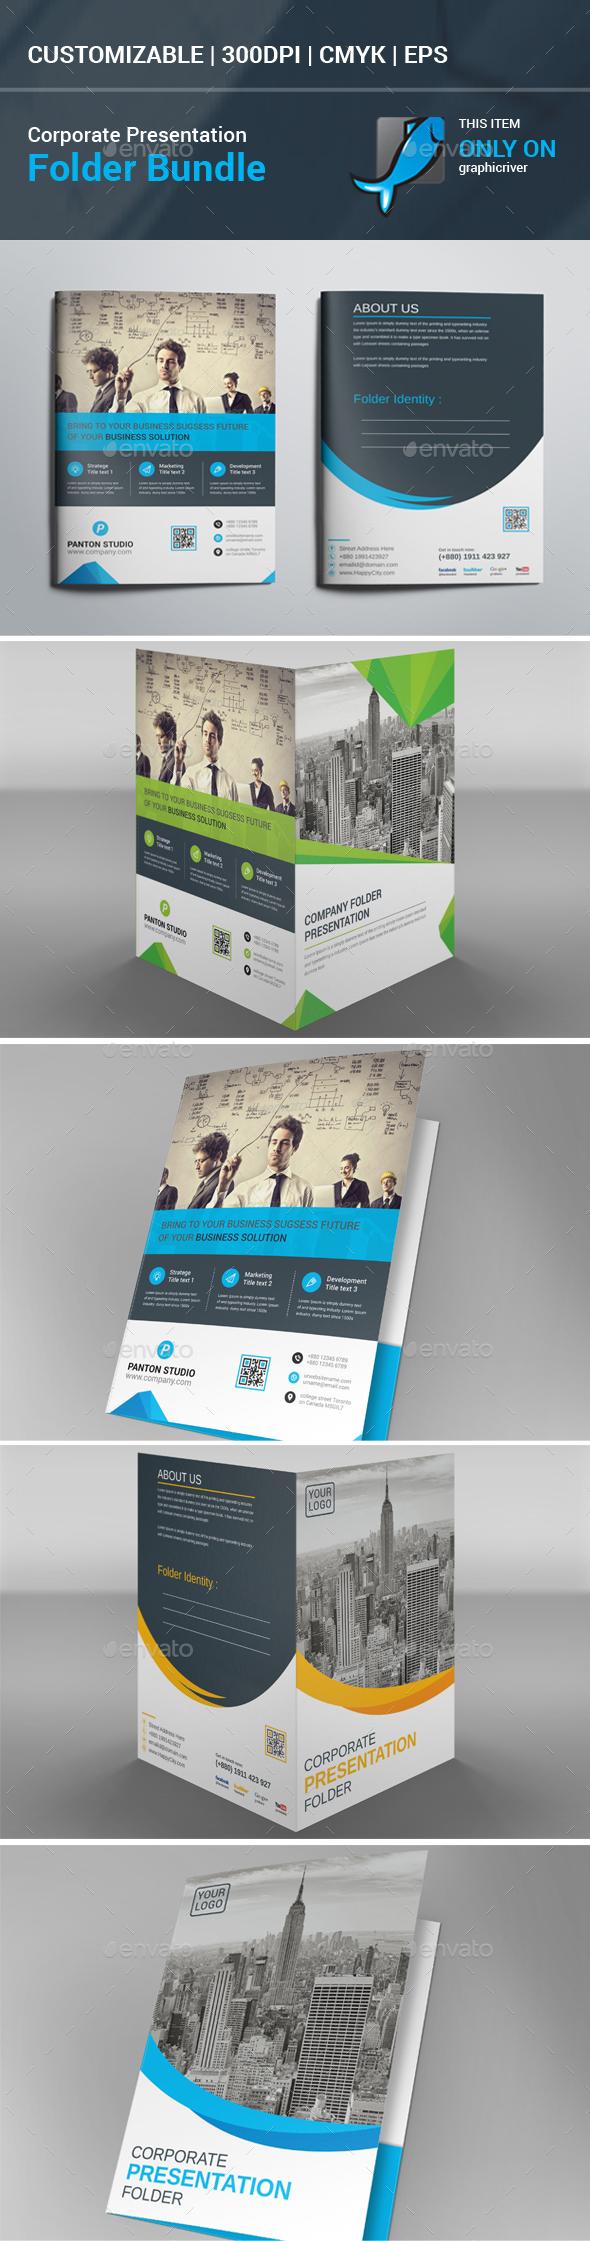 Corporate Presentation Folder Bundle - Stationery Print Templates